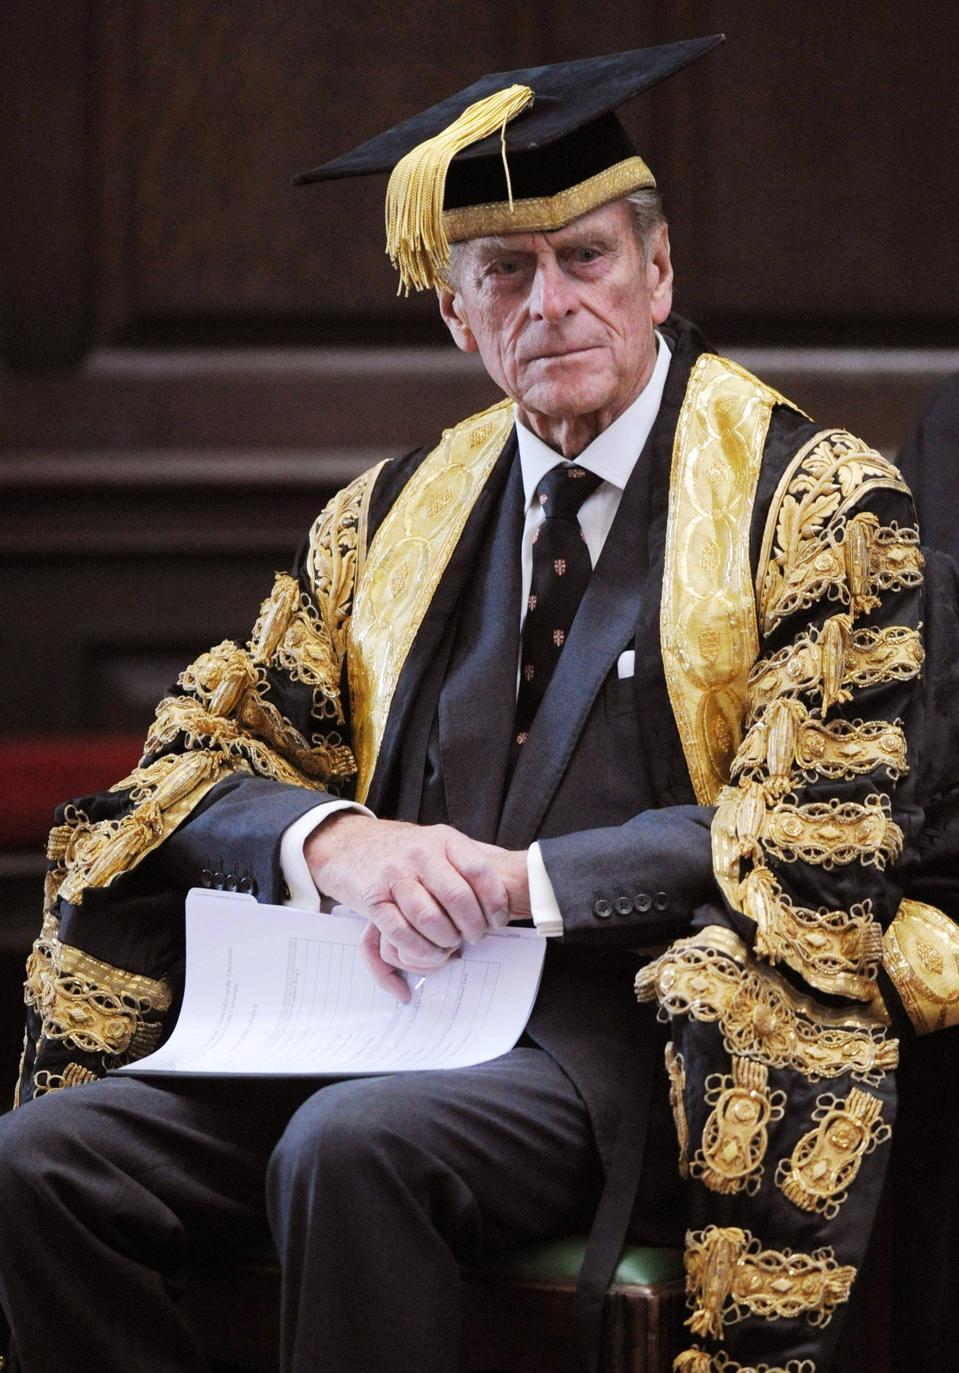 Prince Philip, Duke of Edinburgh as Chancellor of Cambridge University